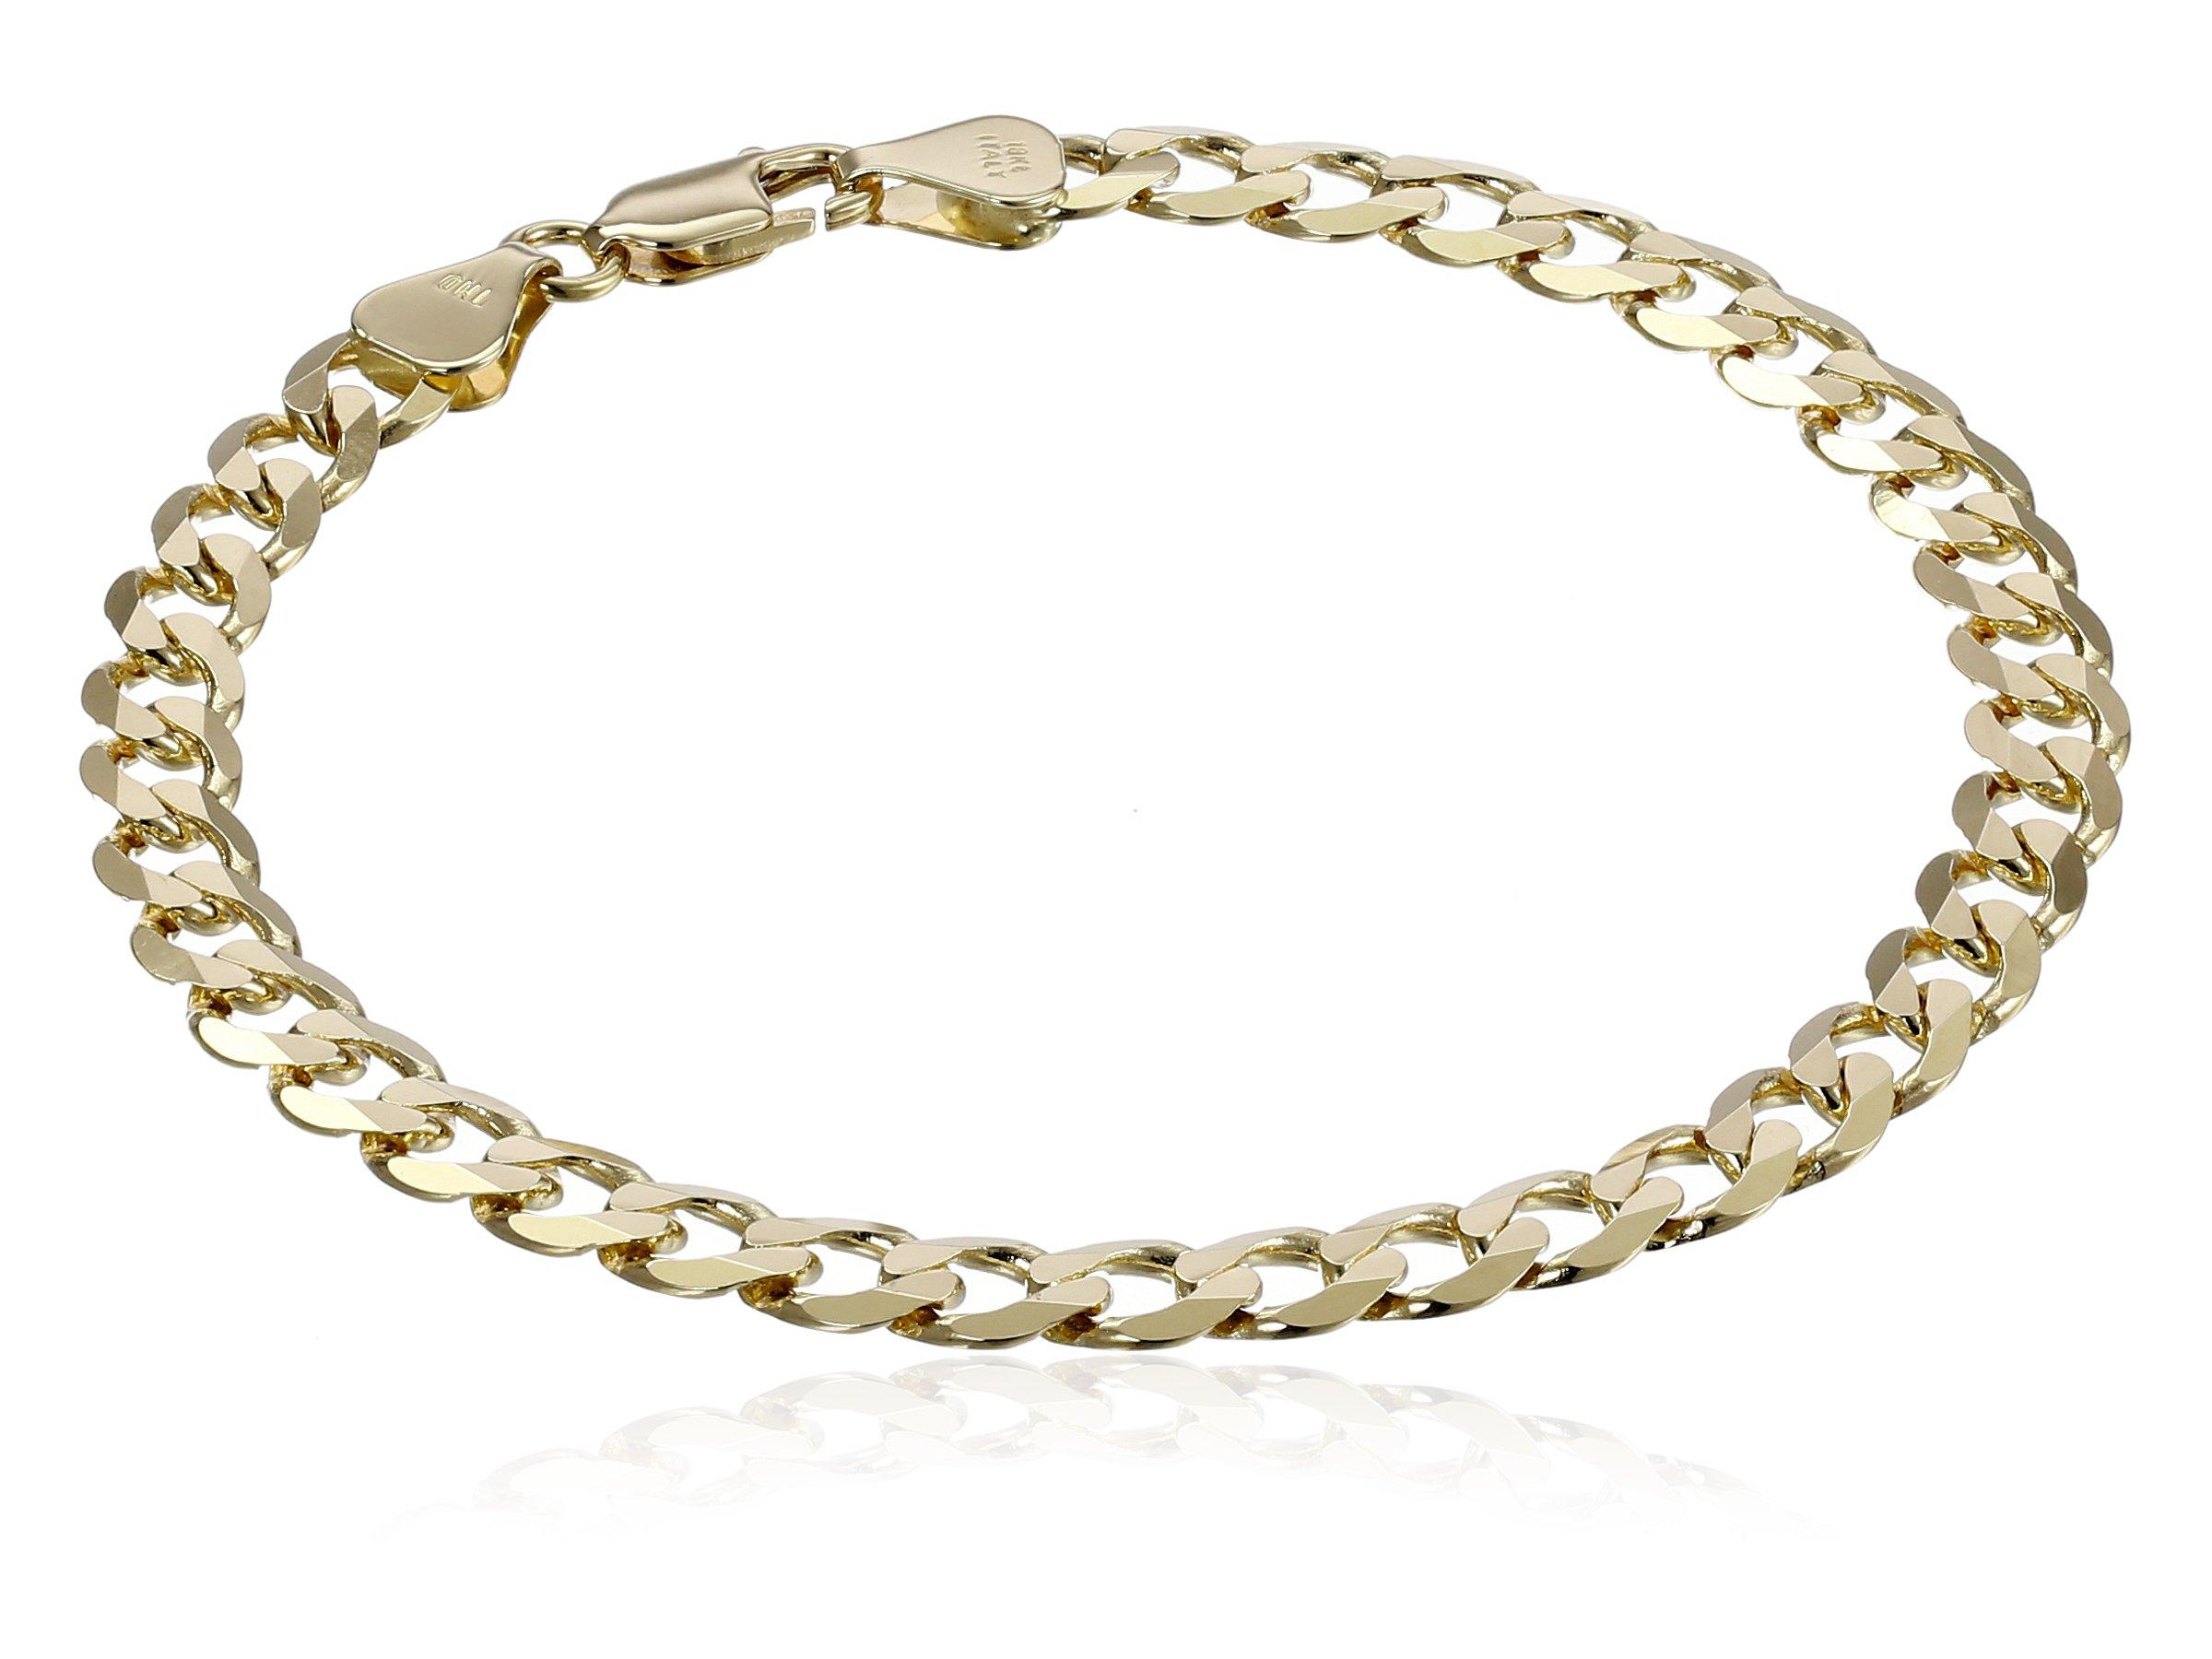 Men's 18k Yellow Gold 5.65mm Italian Diamond-Cut Bevelled Flat Curb Cuban Bracelet, 8''